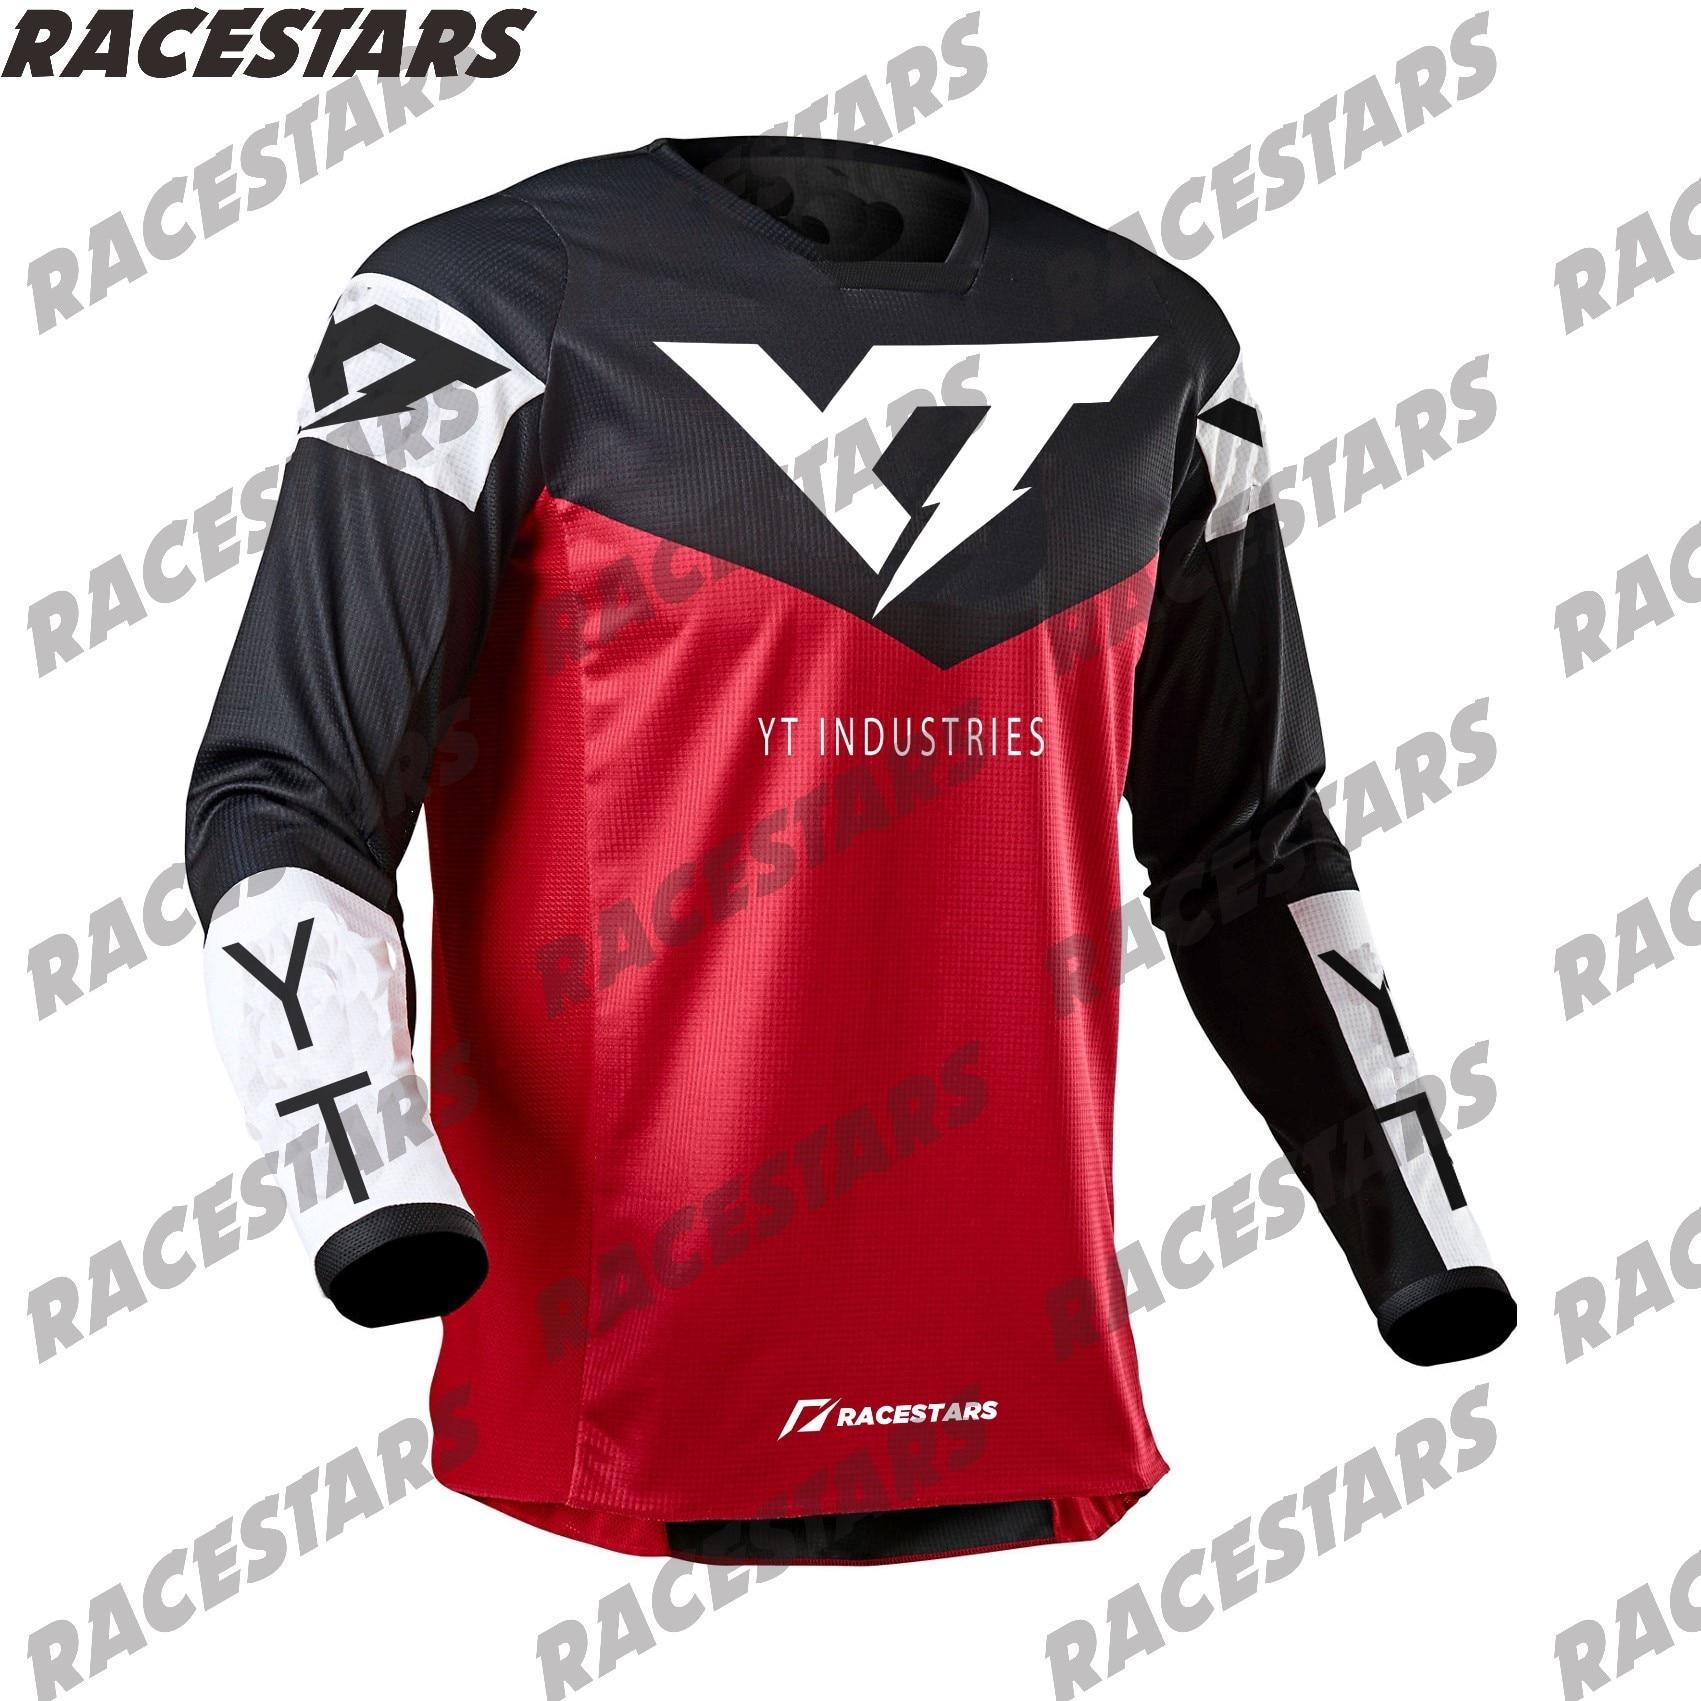 YT industrias Camiseta de Ciclismo Downhill Maillot Ciclismo Hombre Enduro Racing Motocross...